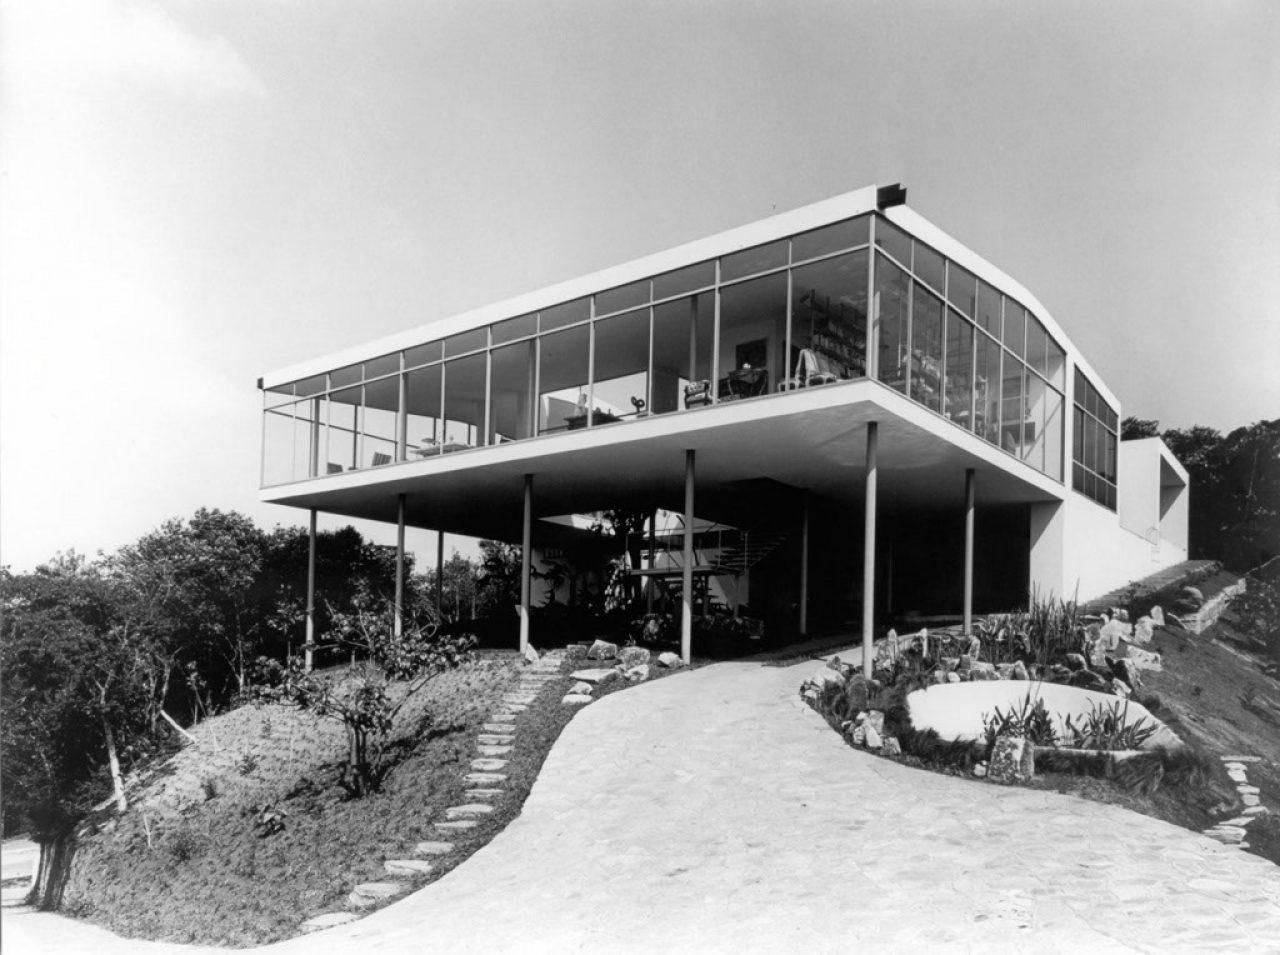 Architectural Vanguard — Ala Champ